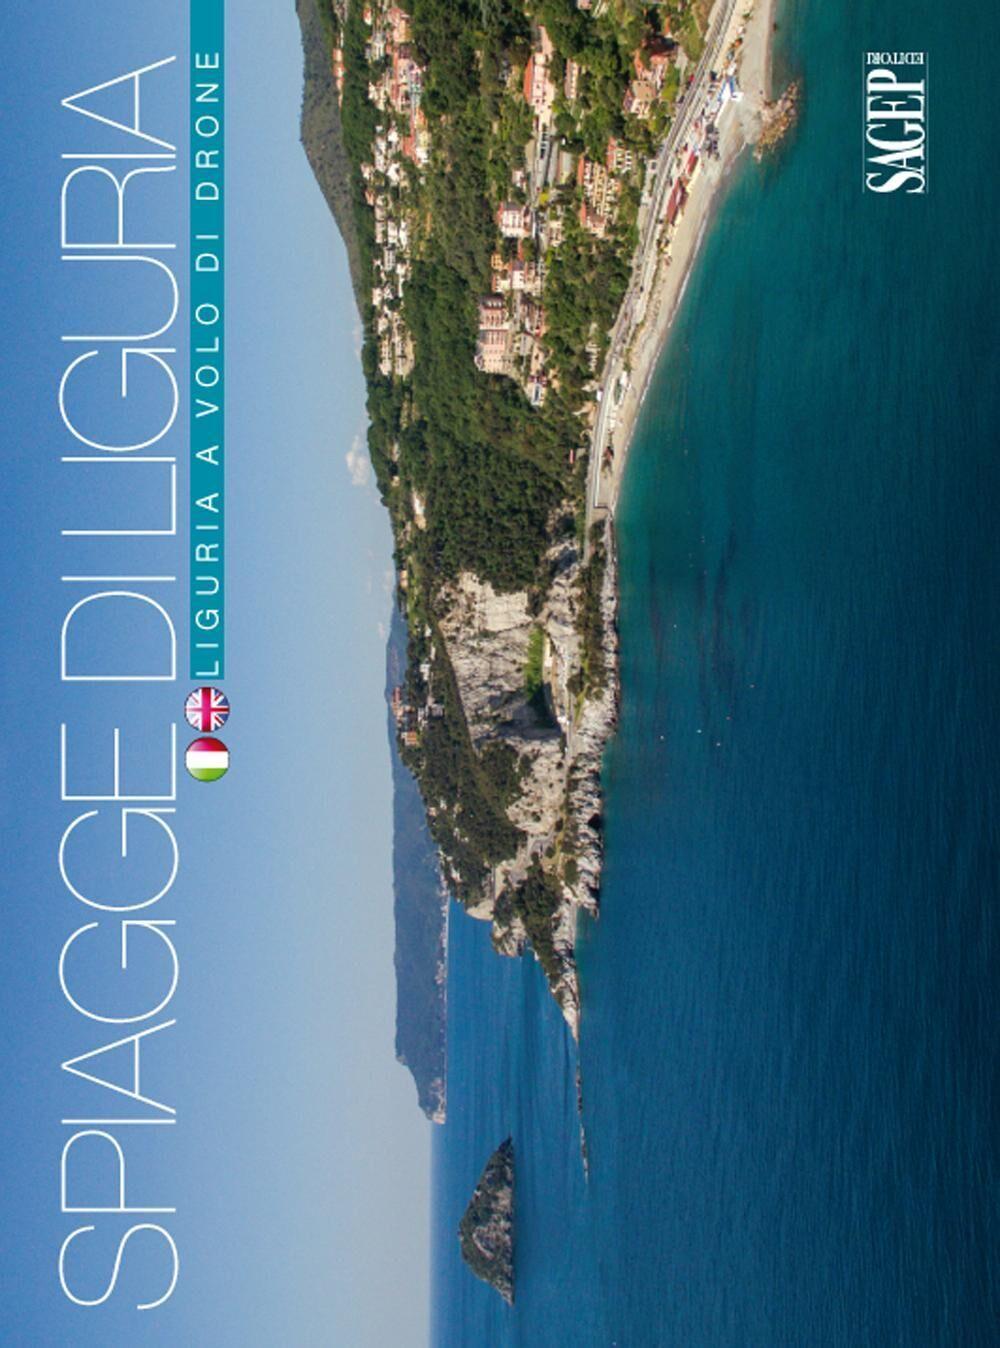 Spiagge di Liguria. Ediz. italiana e inglese